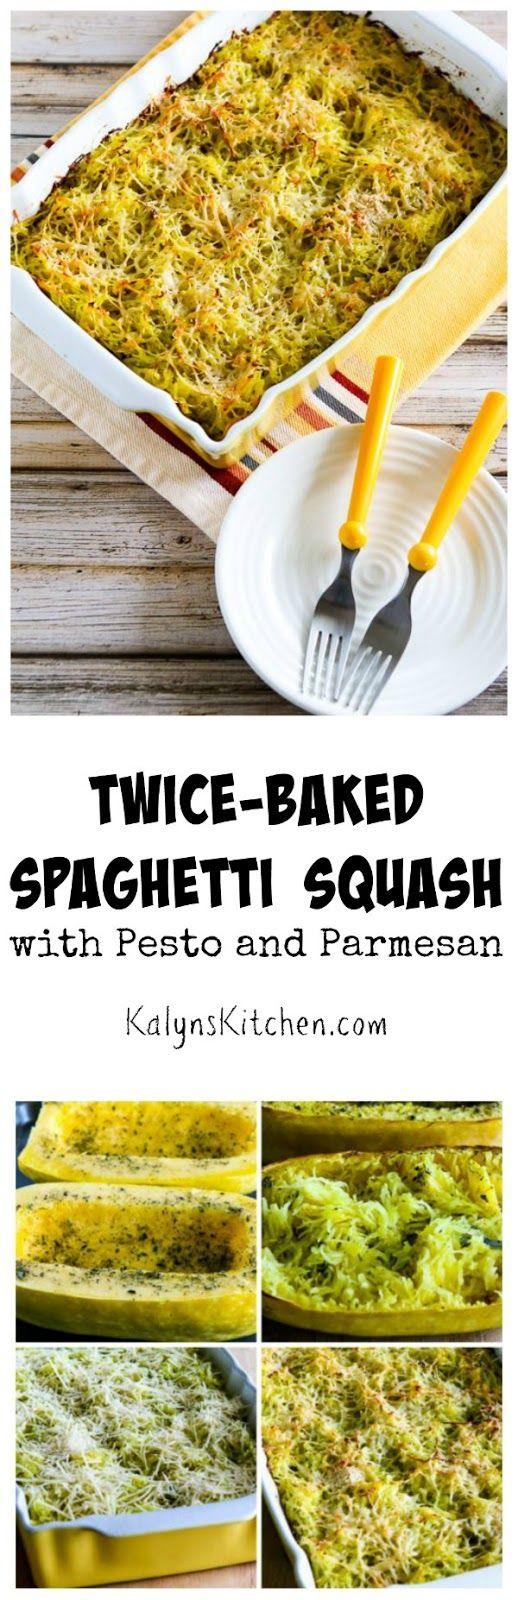 Twice-Baked Spaghetti Squash with Pesto and Parmesan | Squashes, Pesto ...